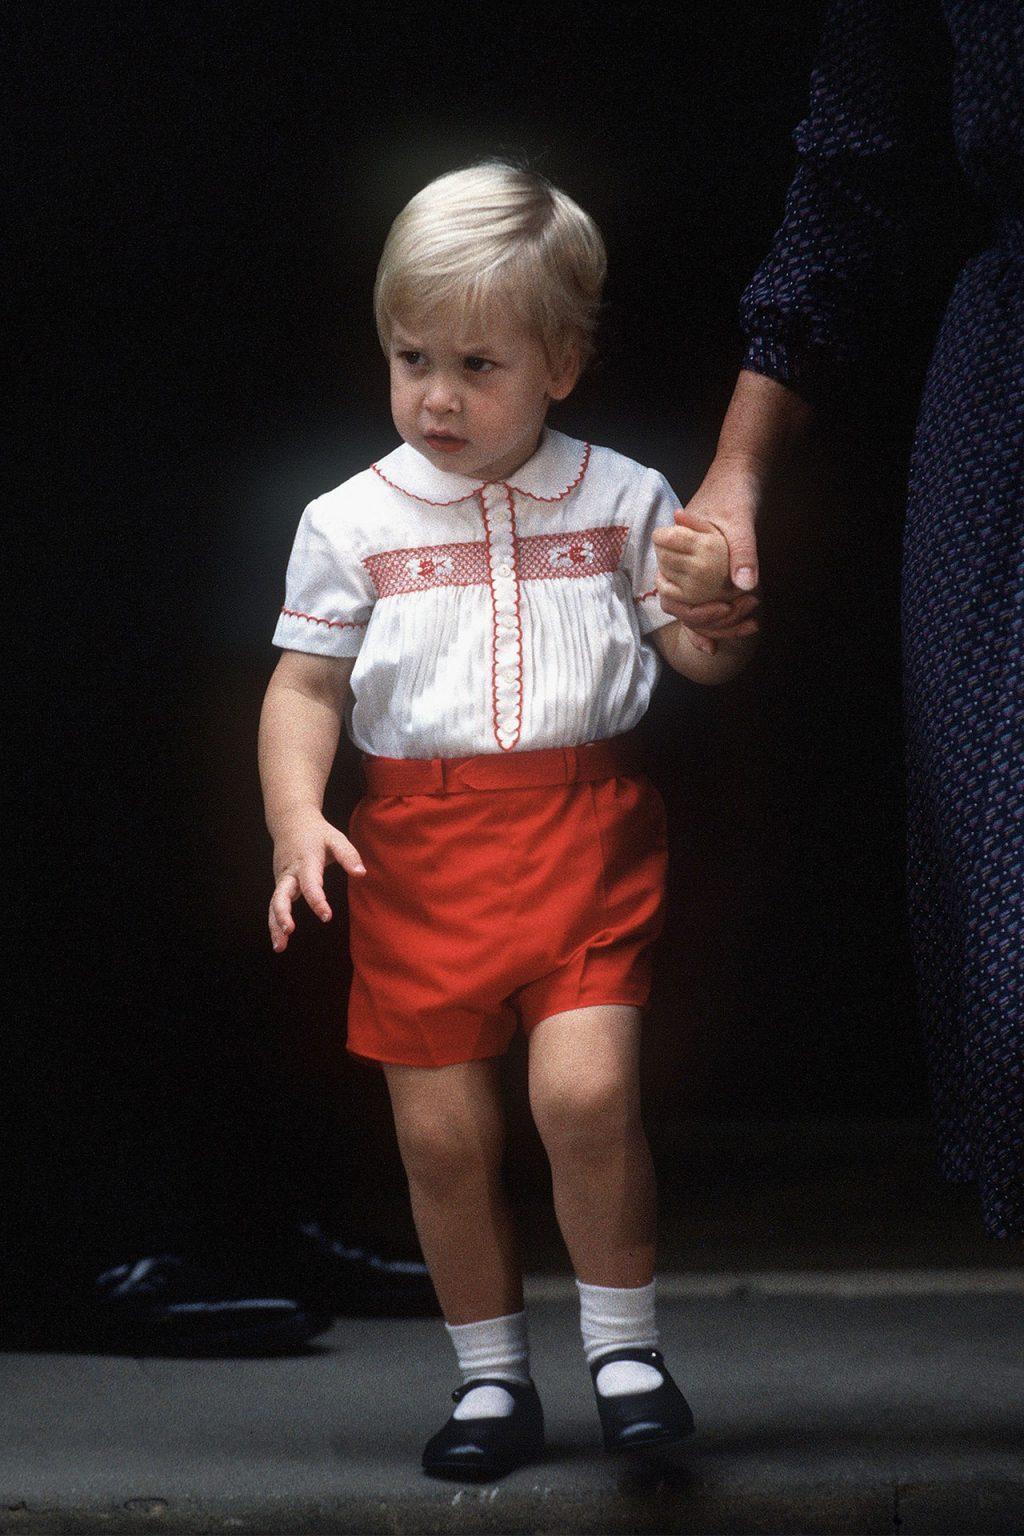 hoàng tử george 3